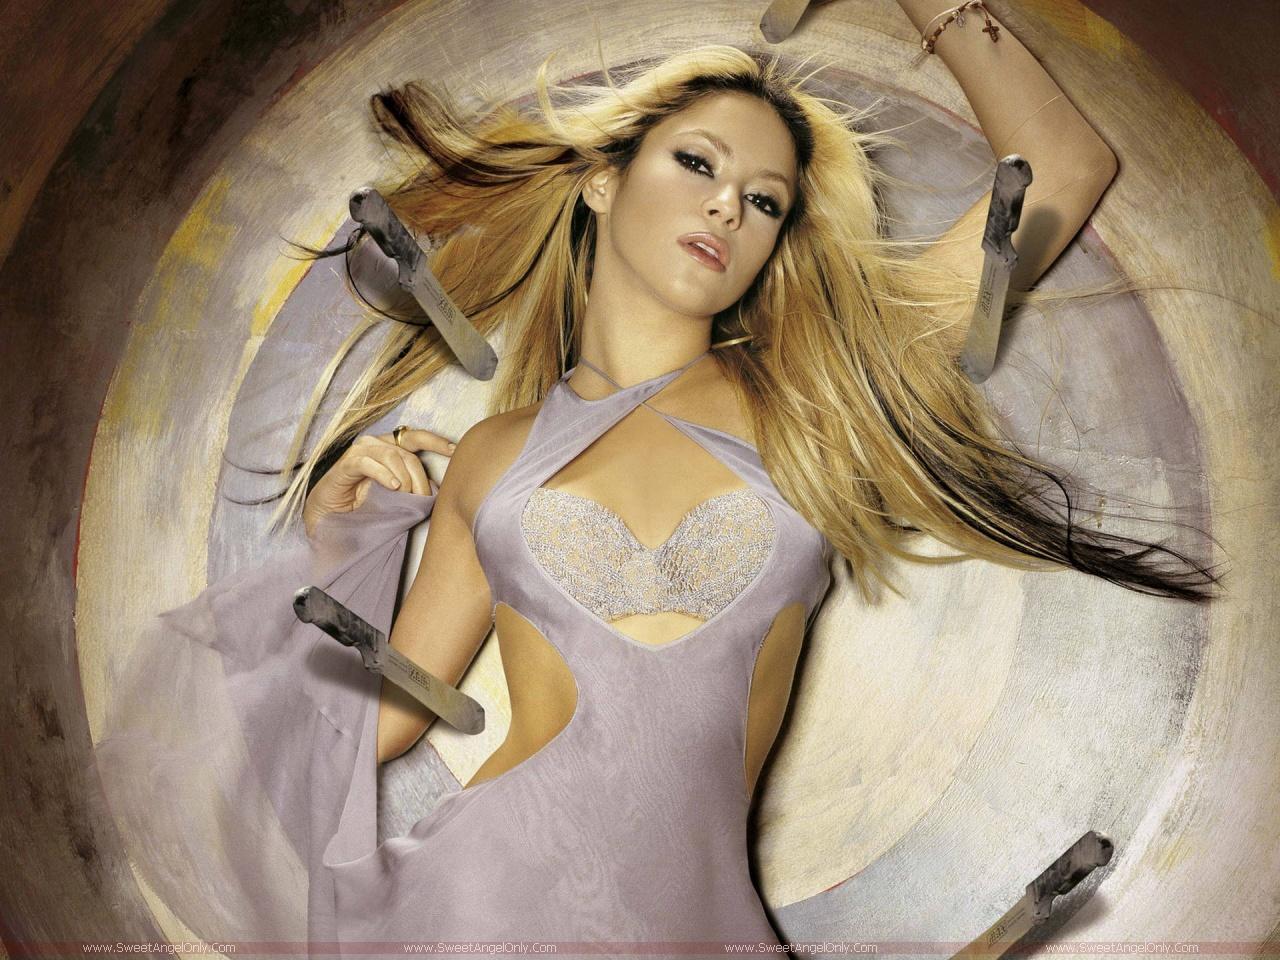 http://2.bp.blogspot.com/-cWLh0J588Og/TmDsZLcTGxI/AAAAAAAAKLI/cSrmG6m-tfo/s1600/Shakira_wallpaper_in_high_resolution.jpg